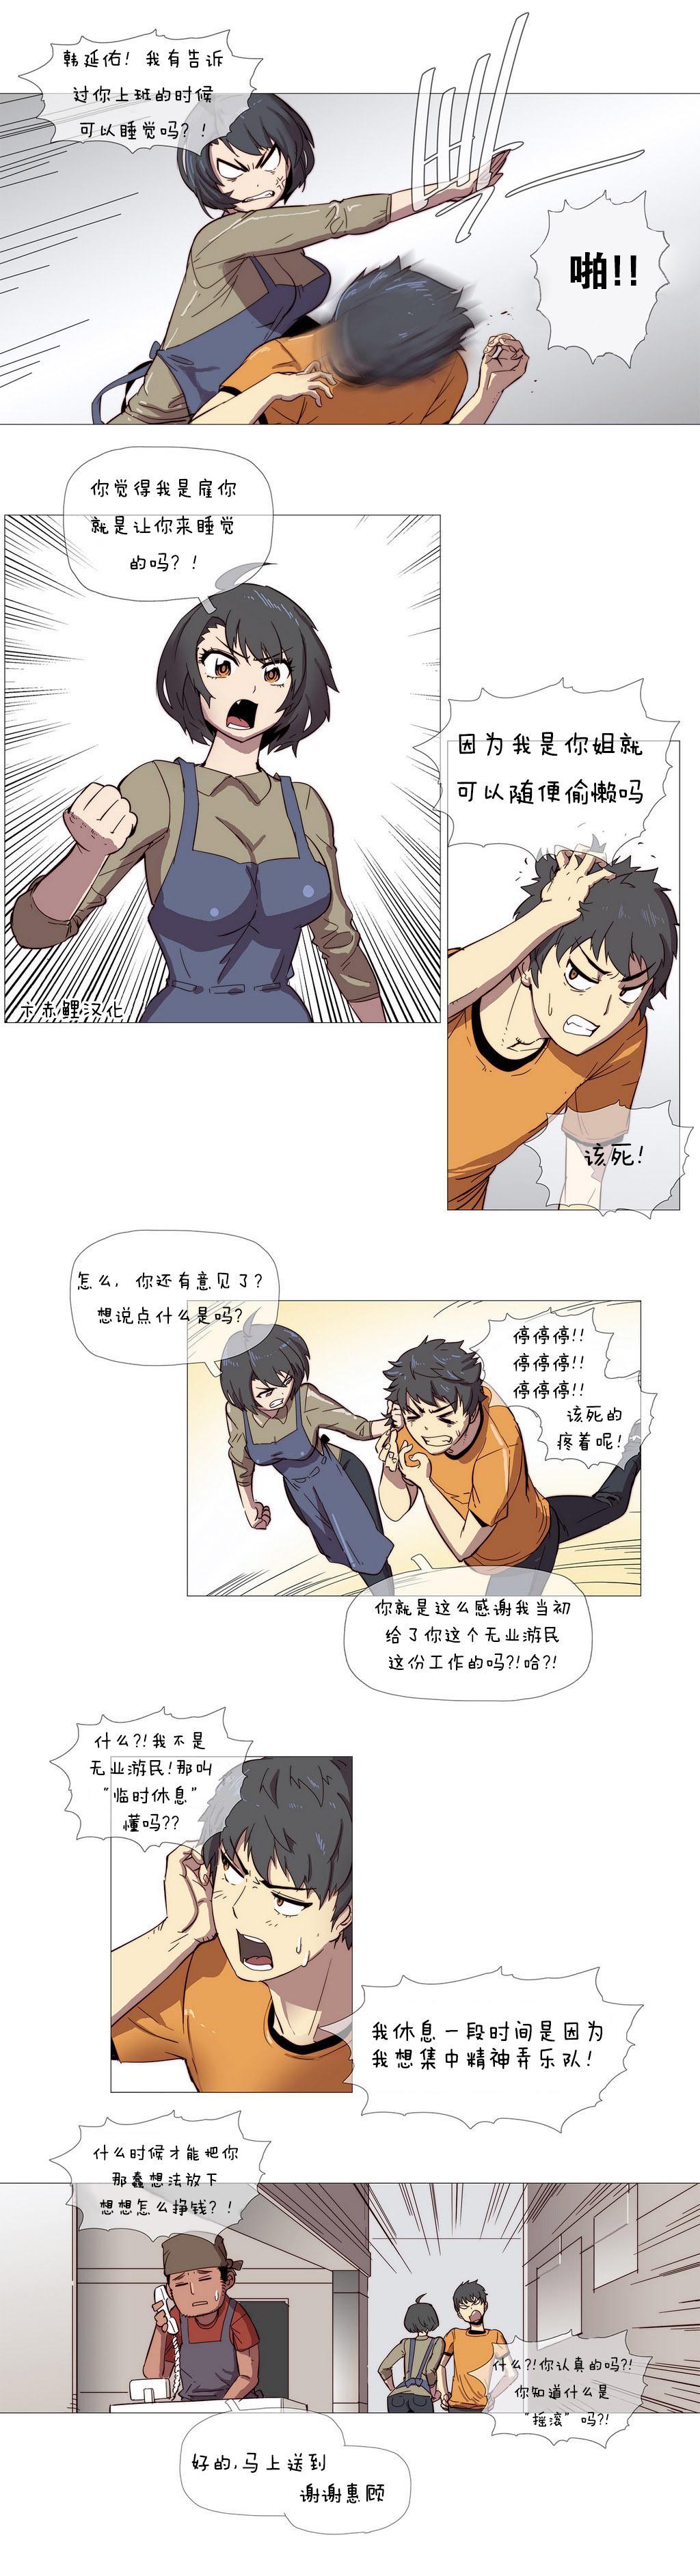 HouseHold Affairs 【卞赤鲤个人汉化】1~21话(持续更新中) 21